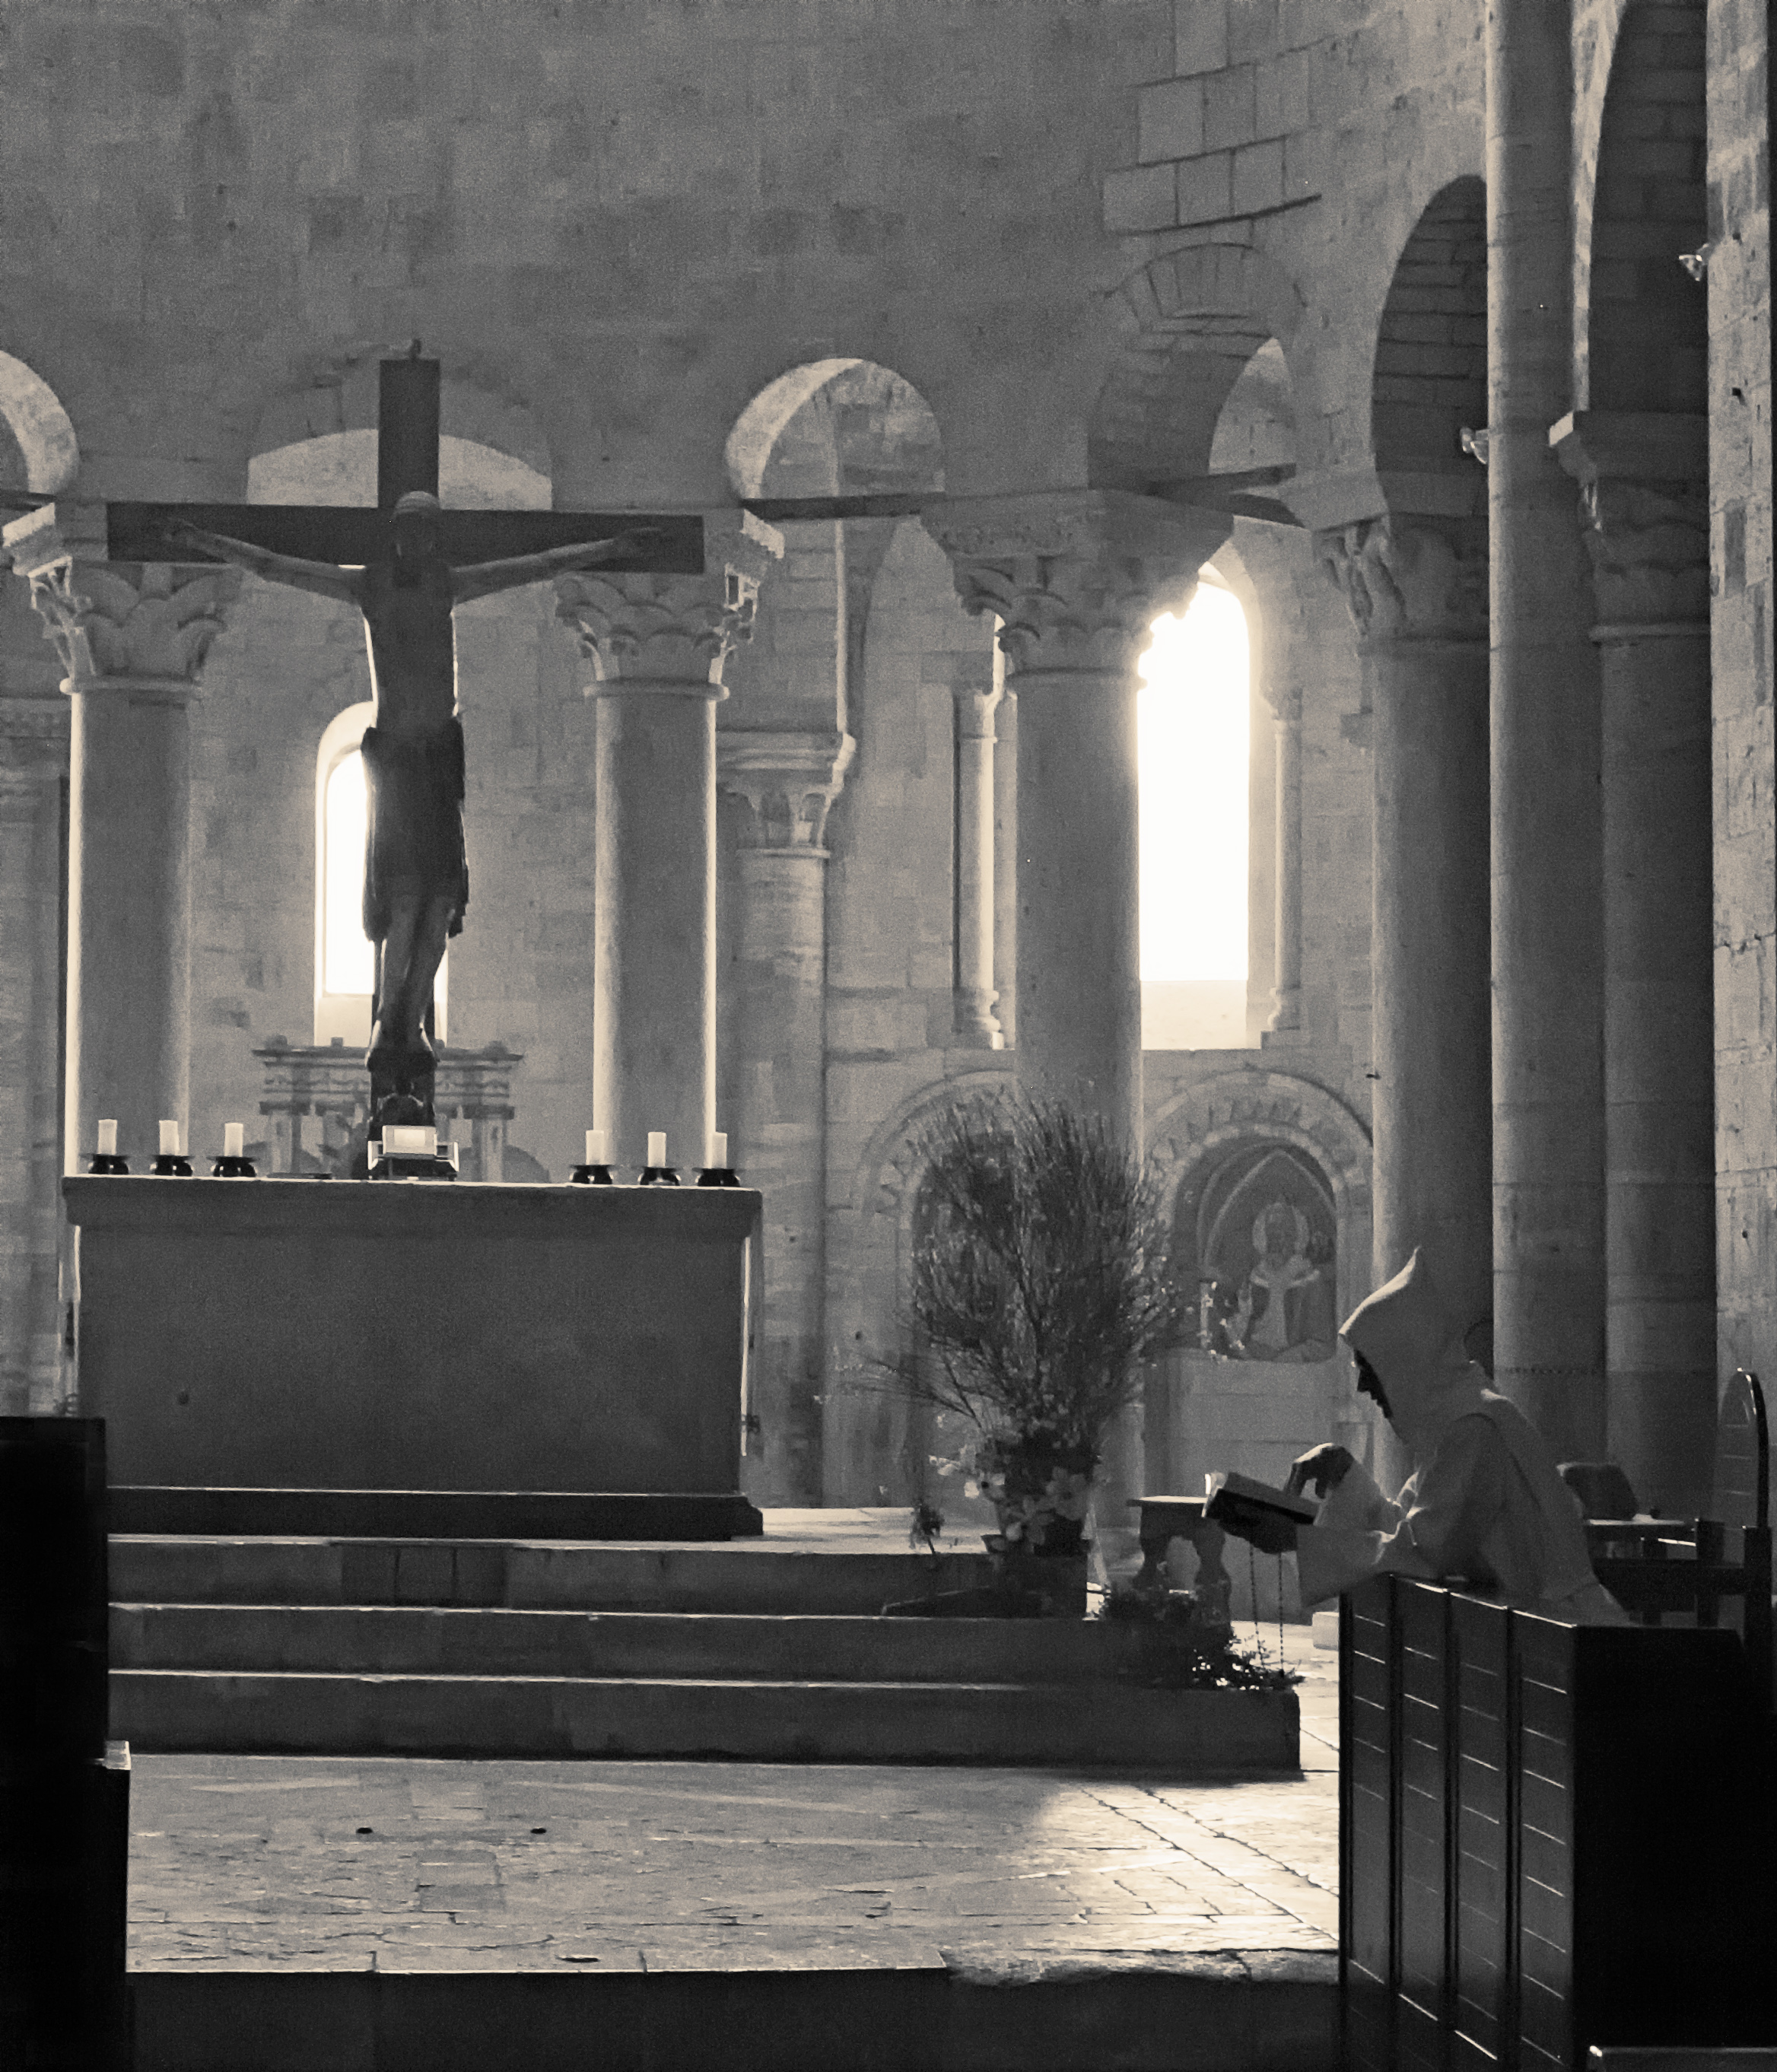 Sant' Antimo, Toscana